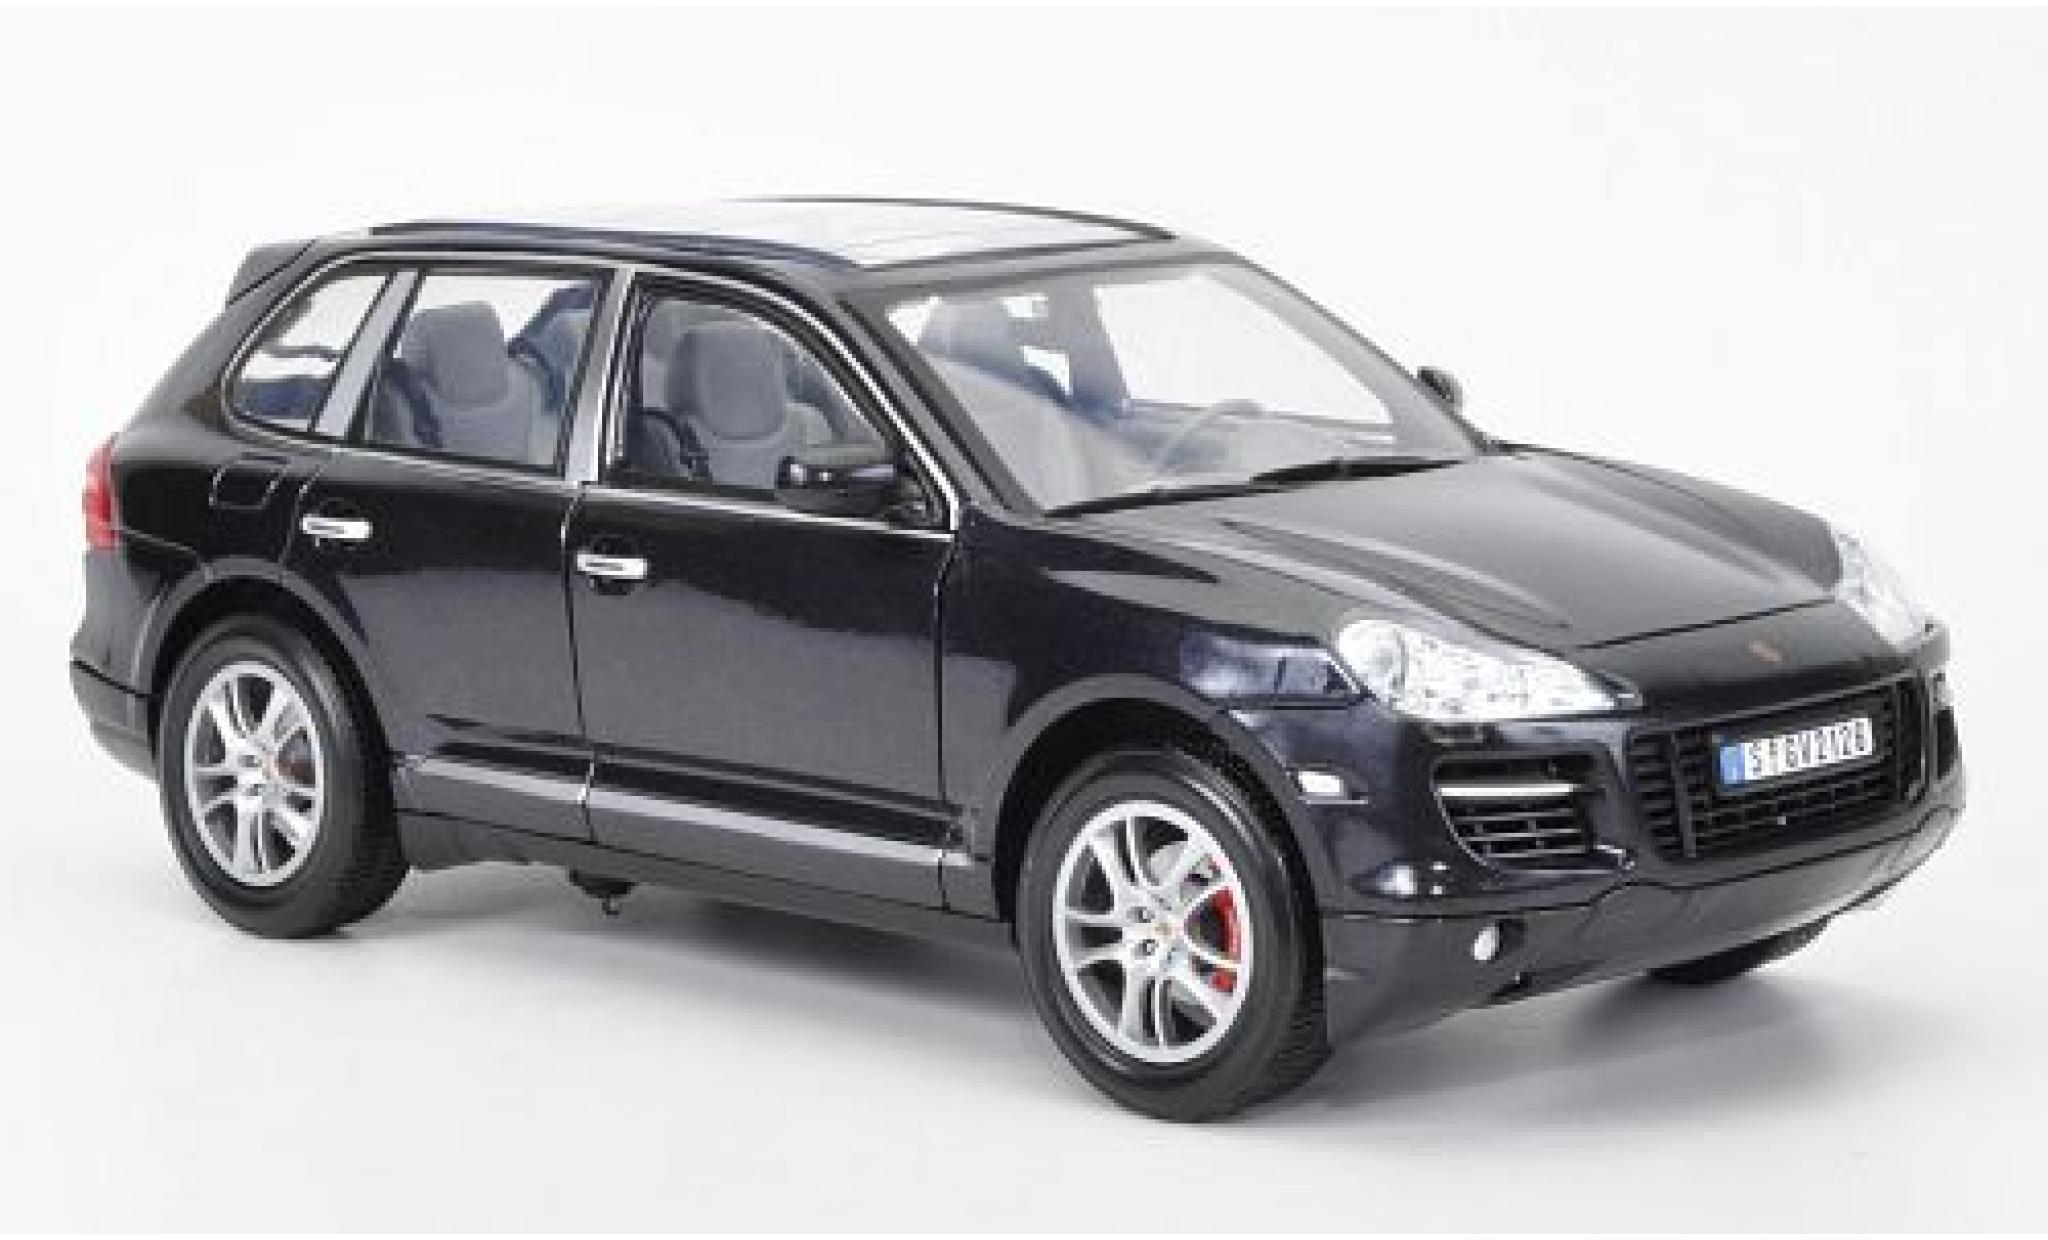 Porsche Cayenne Turbo 1/18 Motormax metallise noire